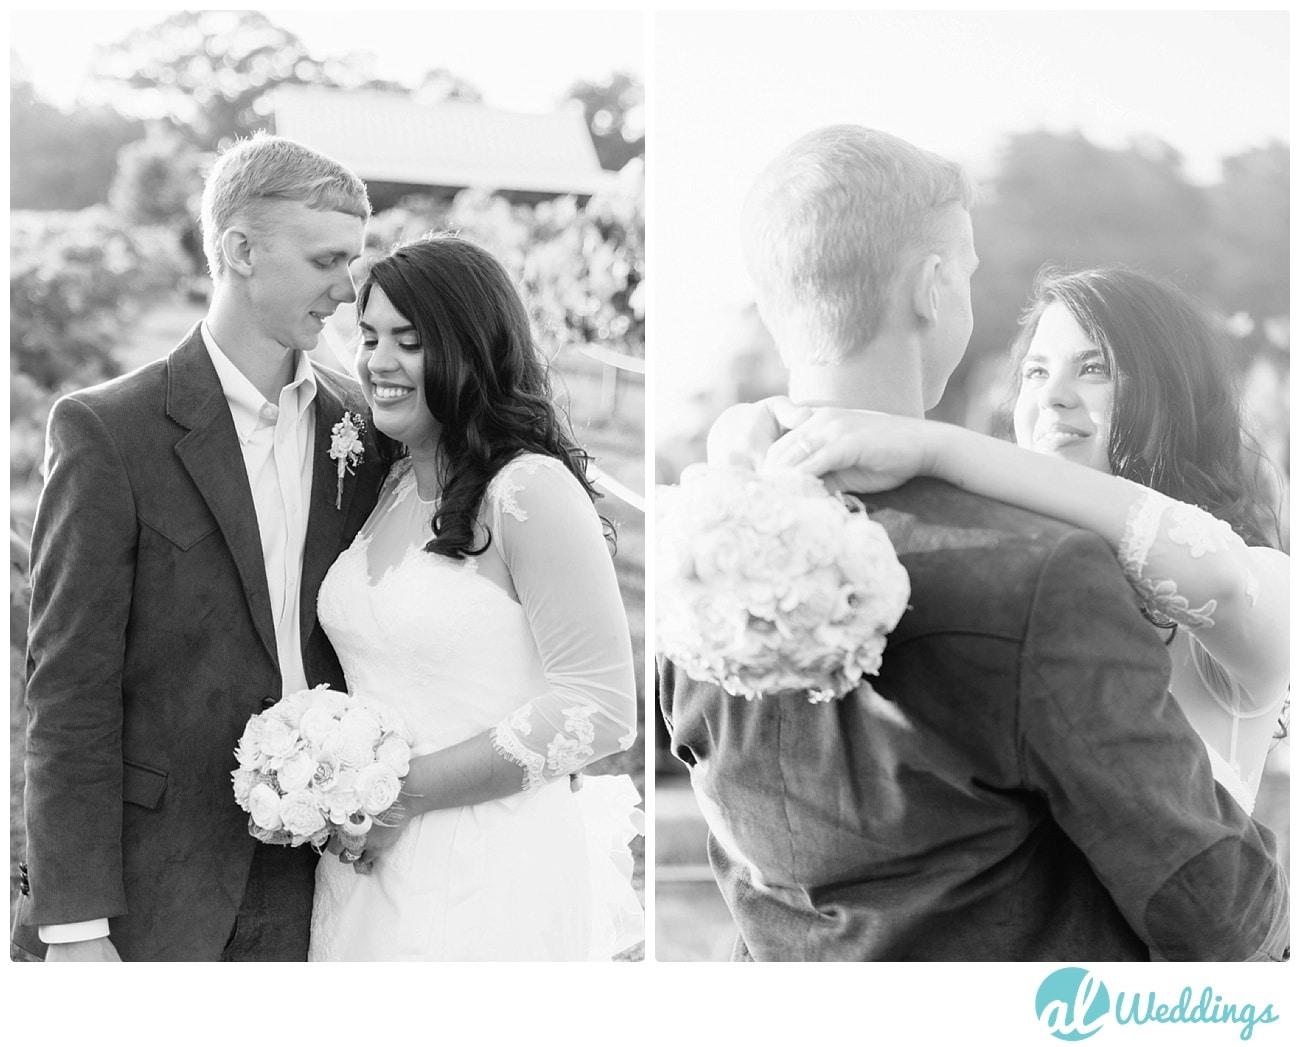 Austin Wedding | Hidden Meadows Vineyard | Alabama Wedding Photographer-52.jpg